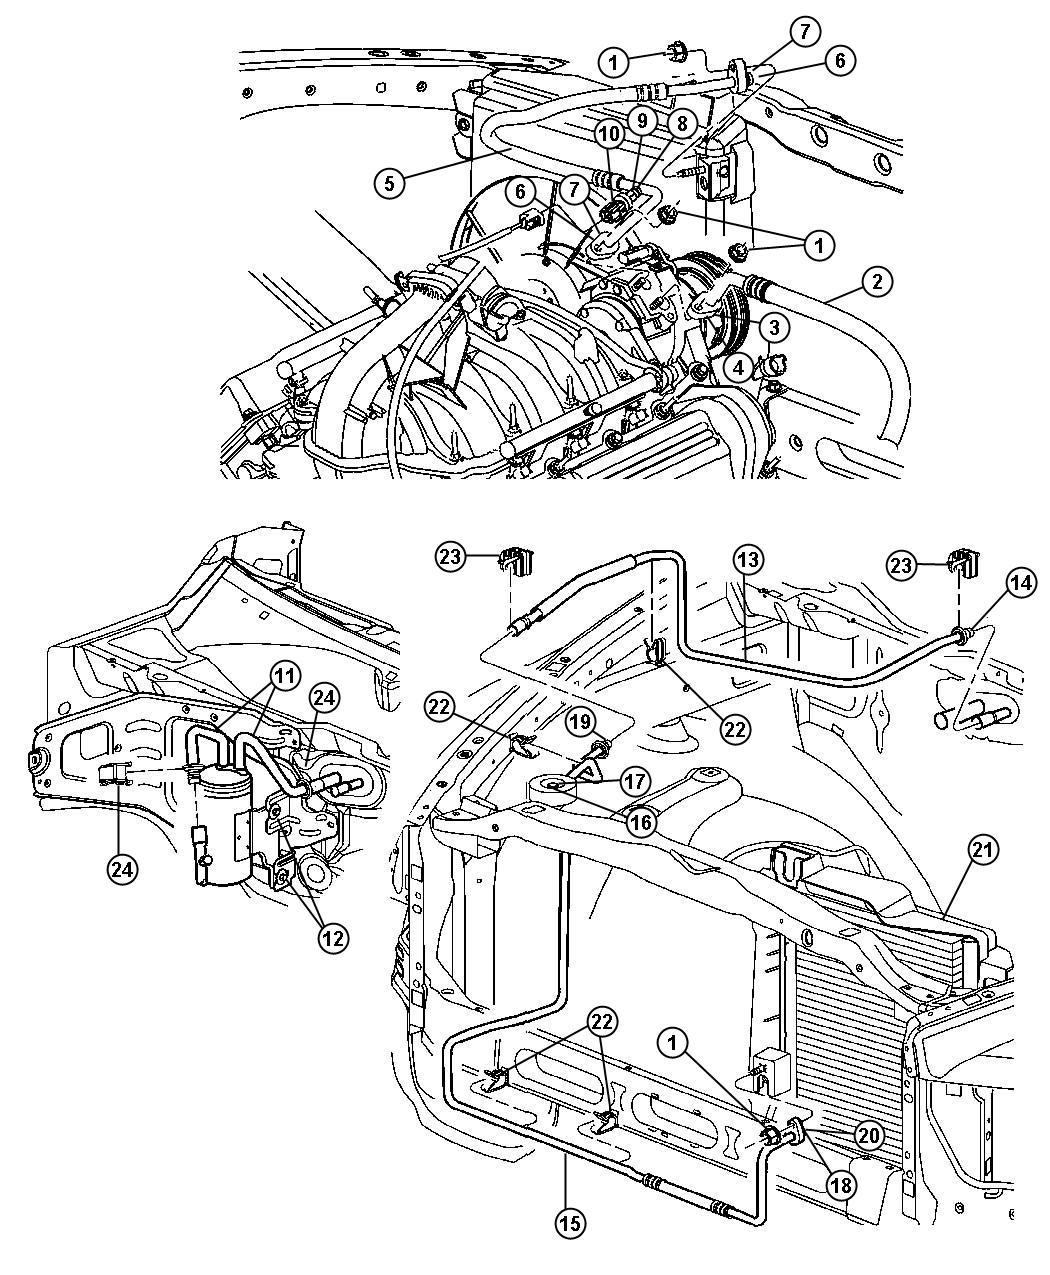 [DIAGRAM] Wiring Cummins Diagram V8 300m FULL Version HD